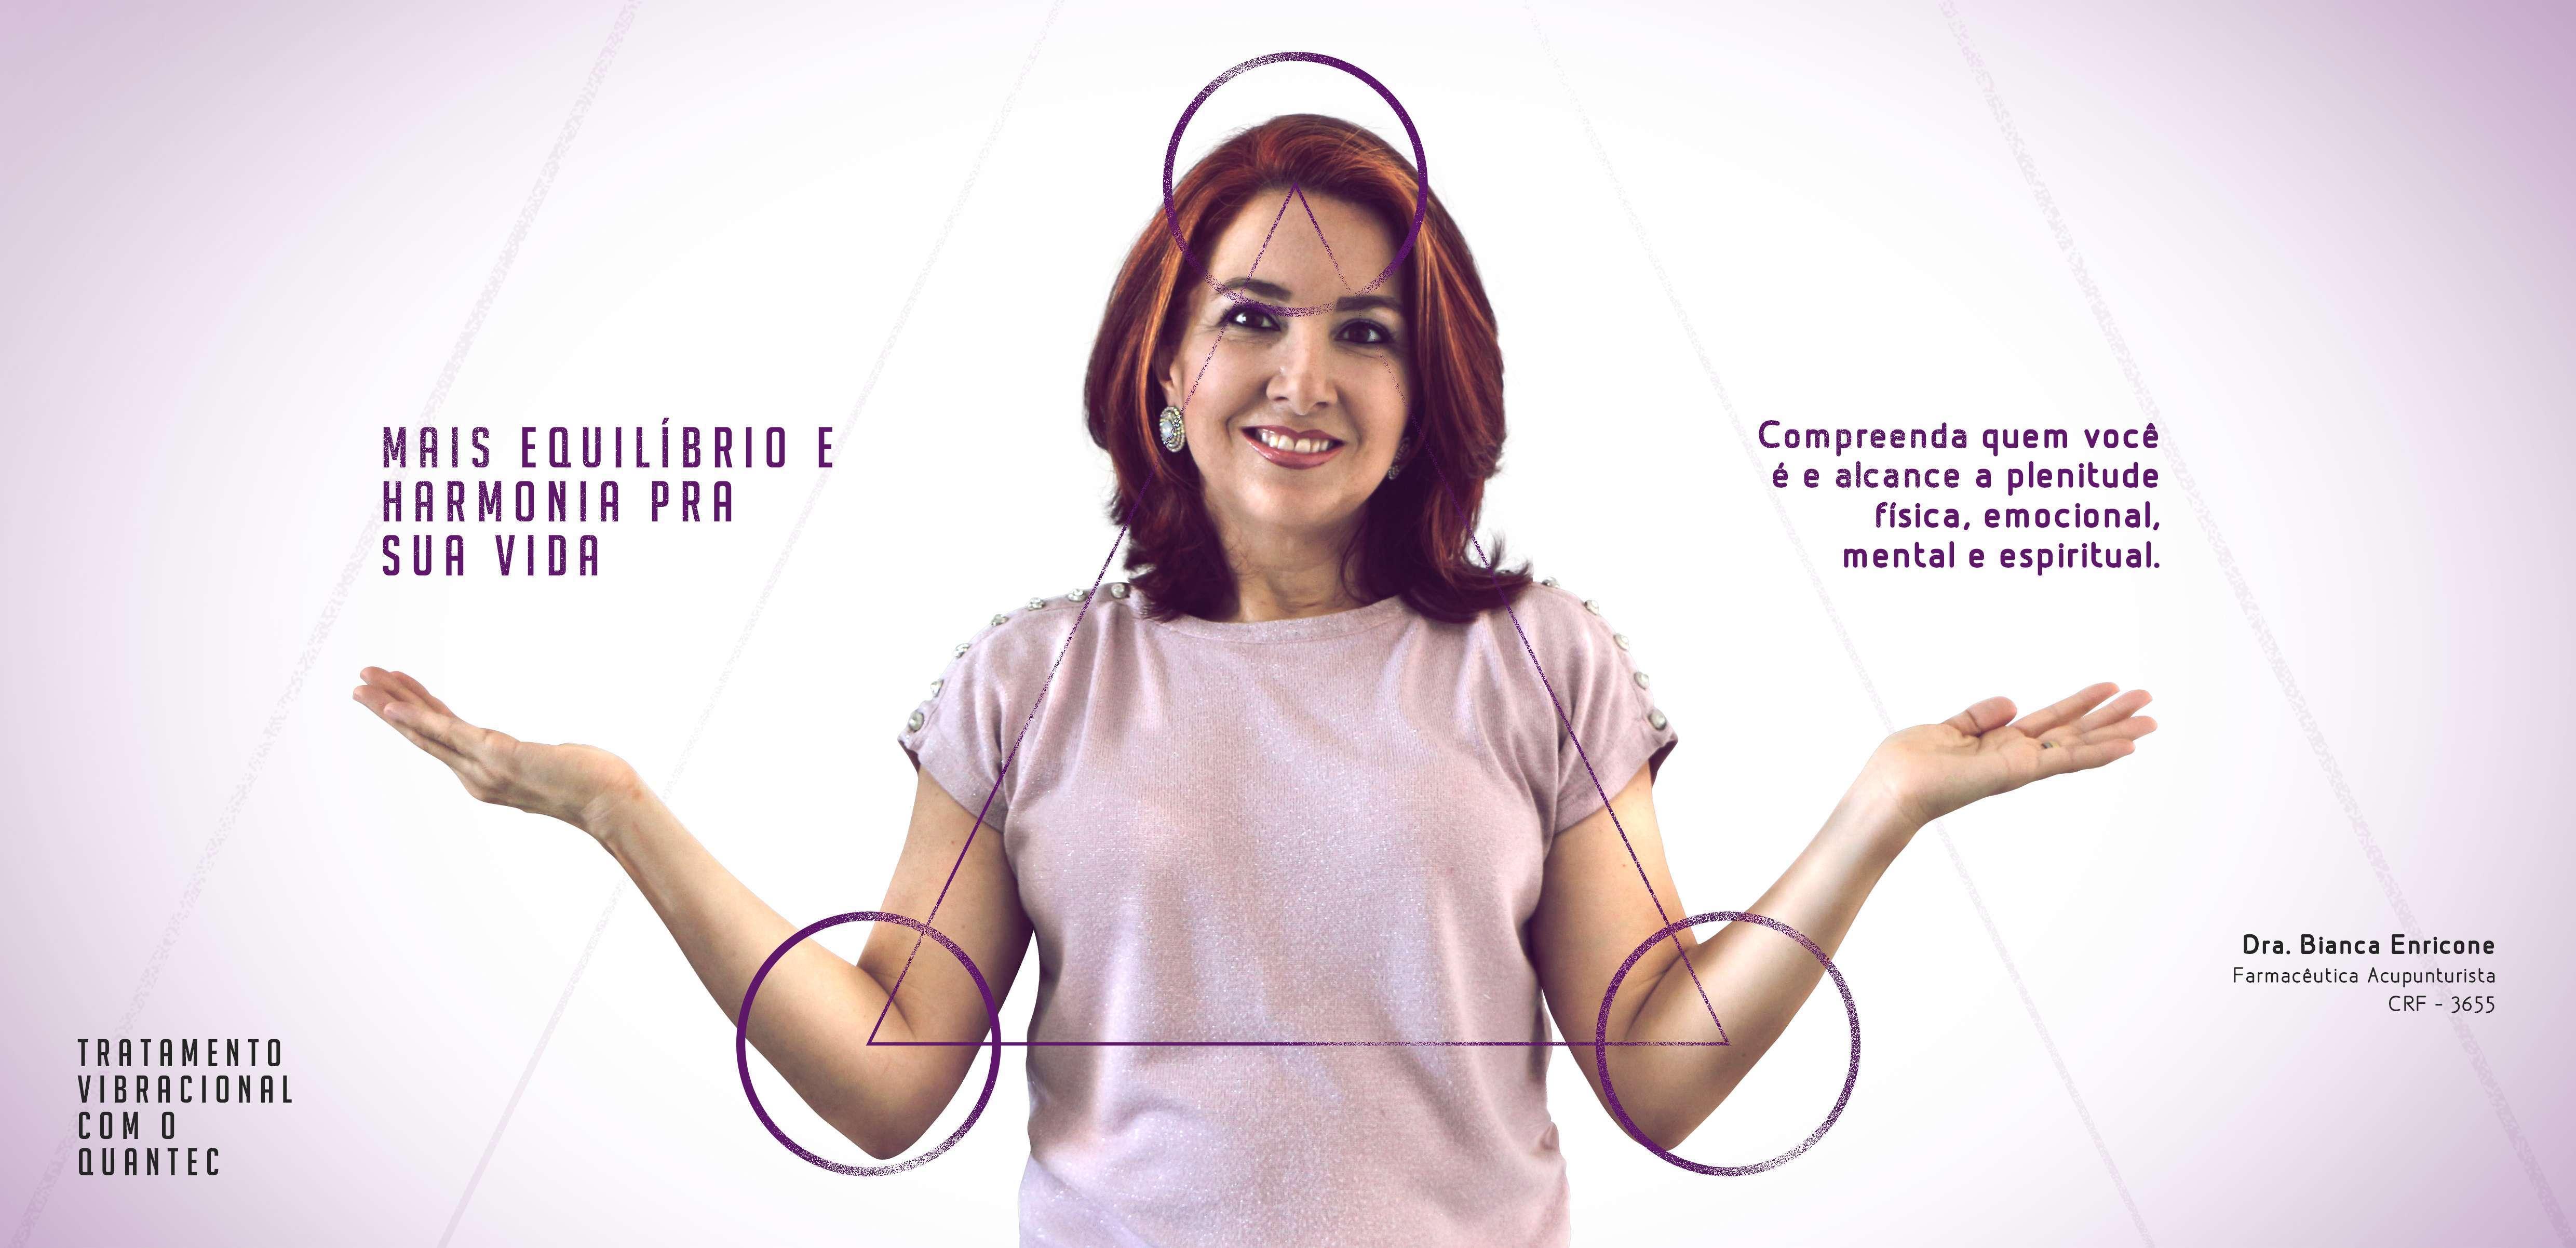 3514-18-INTELIGENCIA-MARKETING-Bianca-Enricone-mote-2 Title category